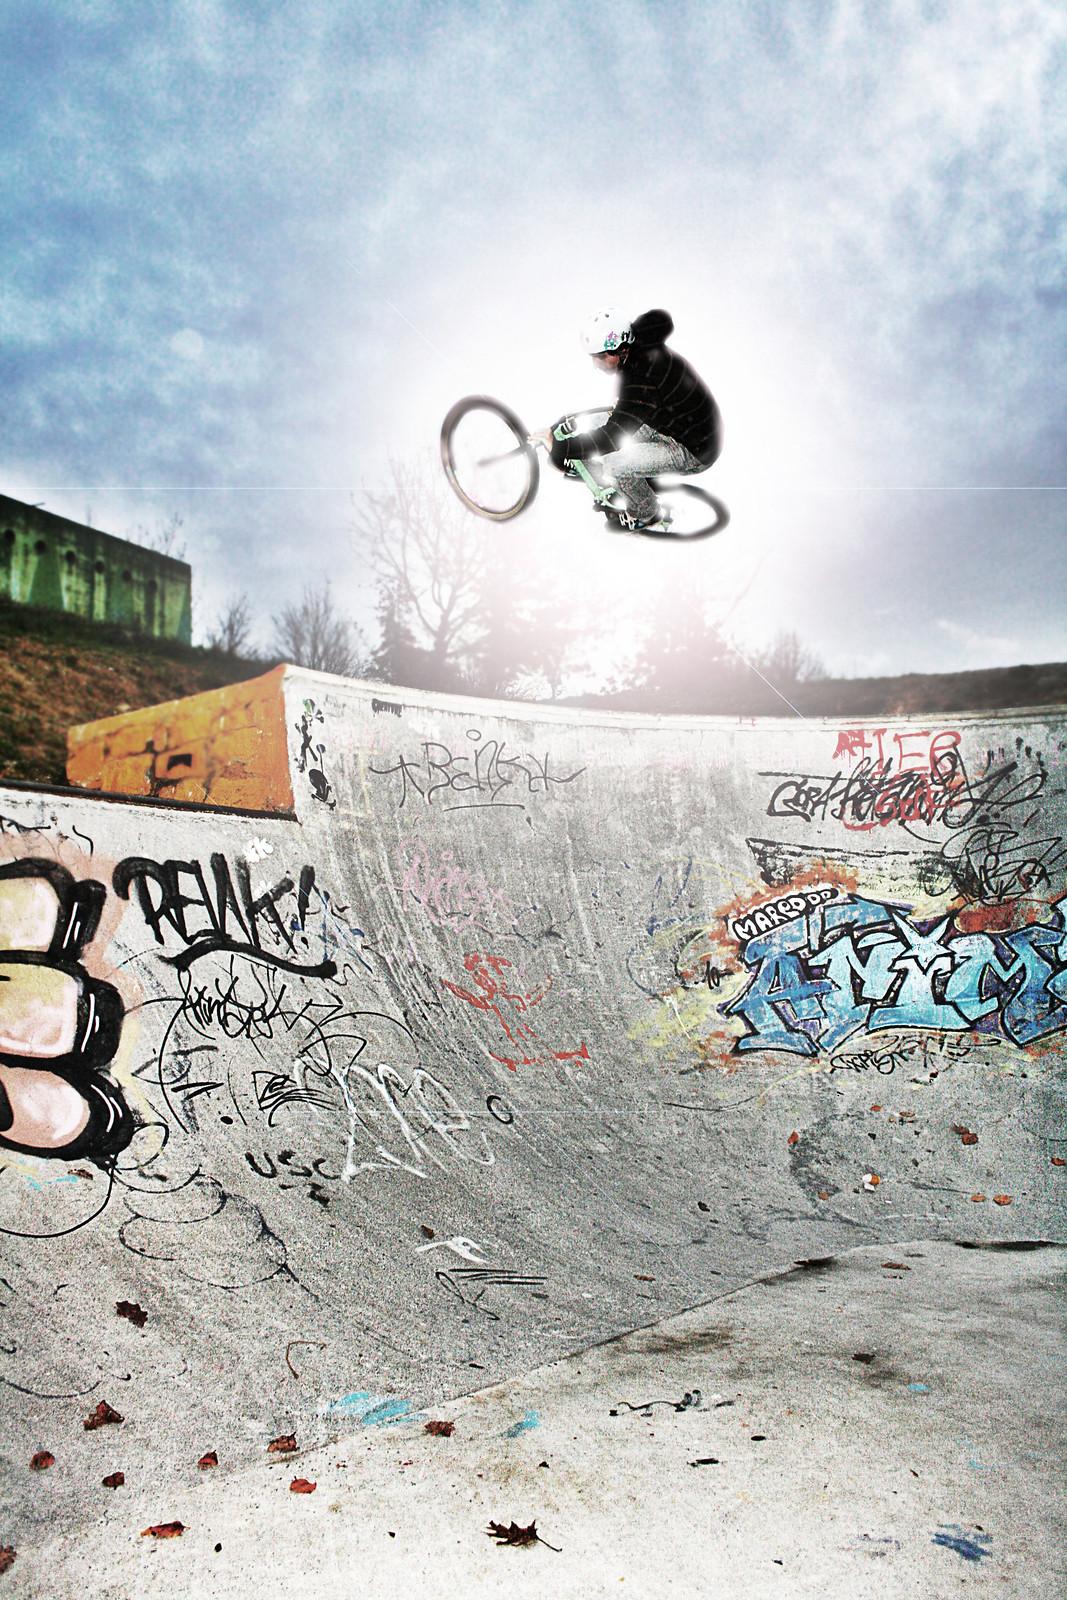 1 - egino - Mountain Biking Pictures - Vital MTB